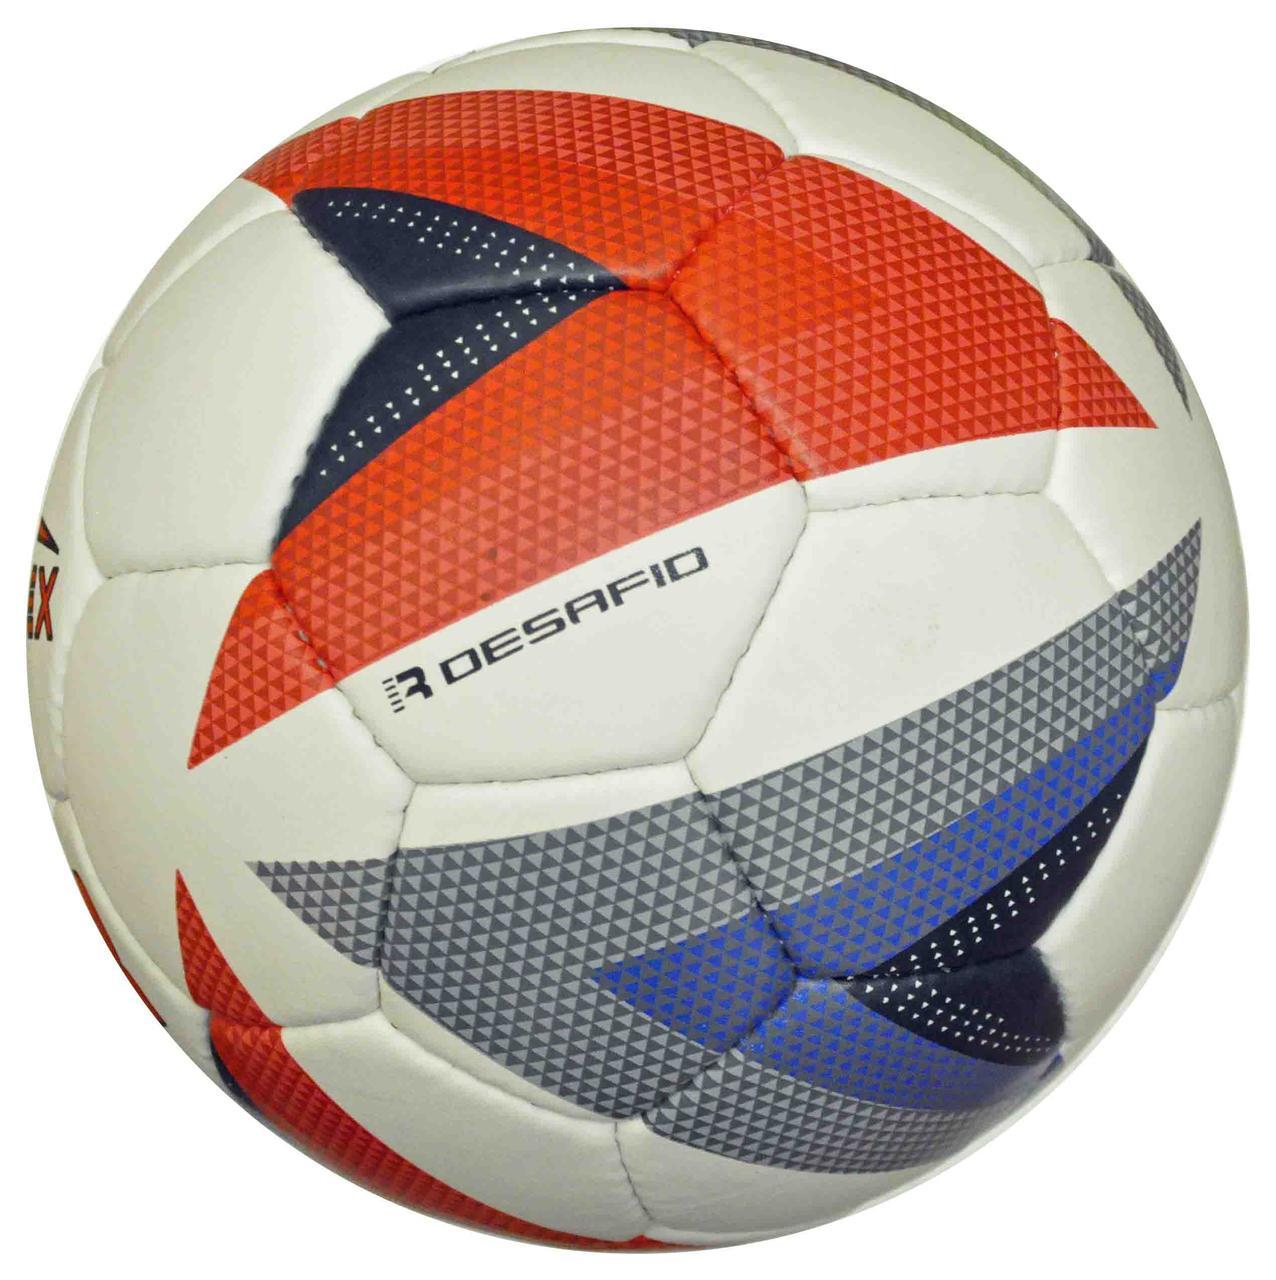 М'яч футбольний Ronex DESAFIO RXG-190